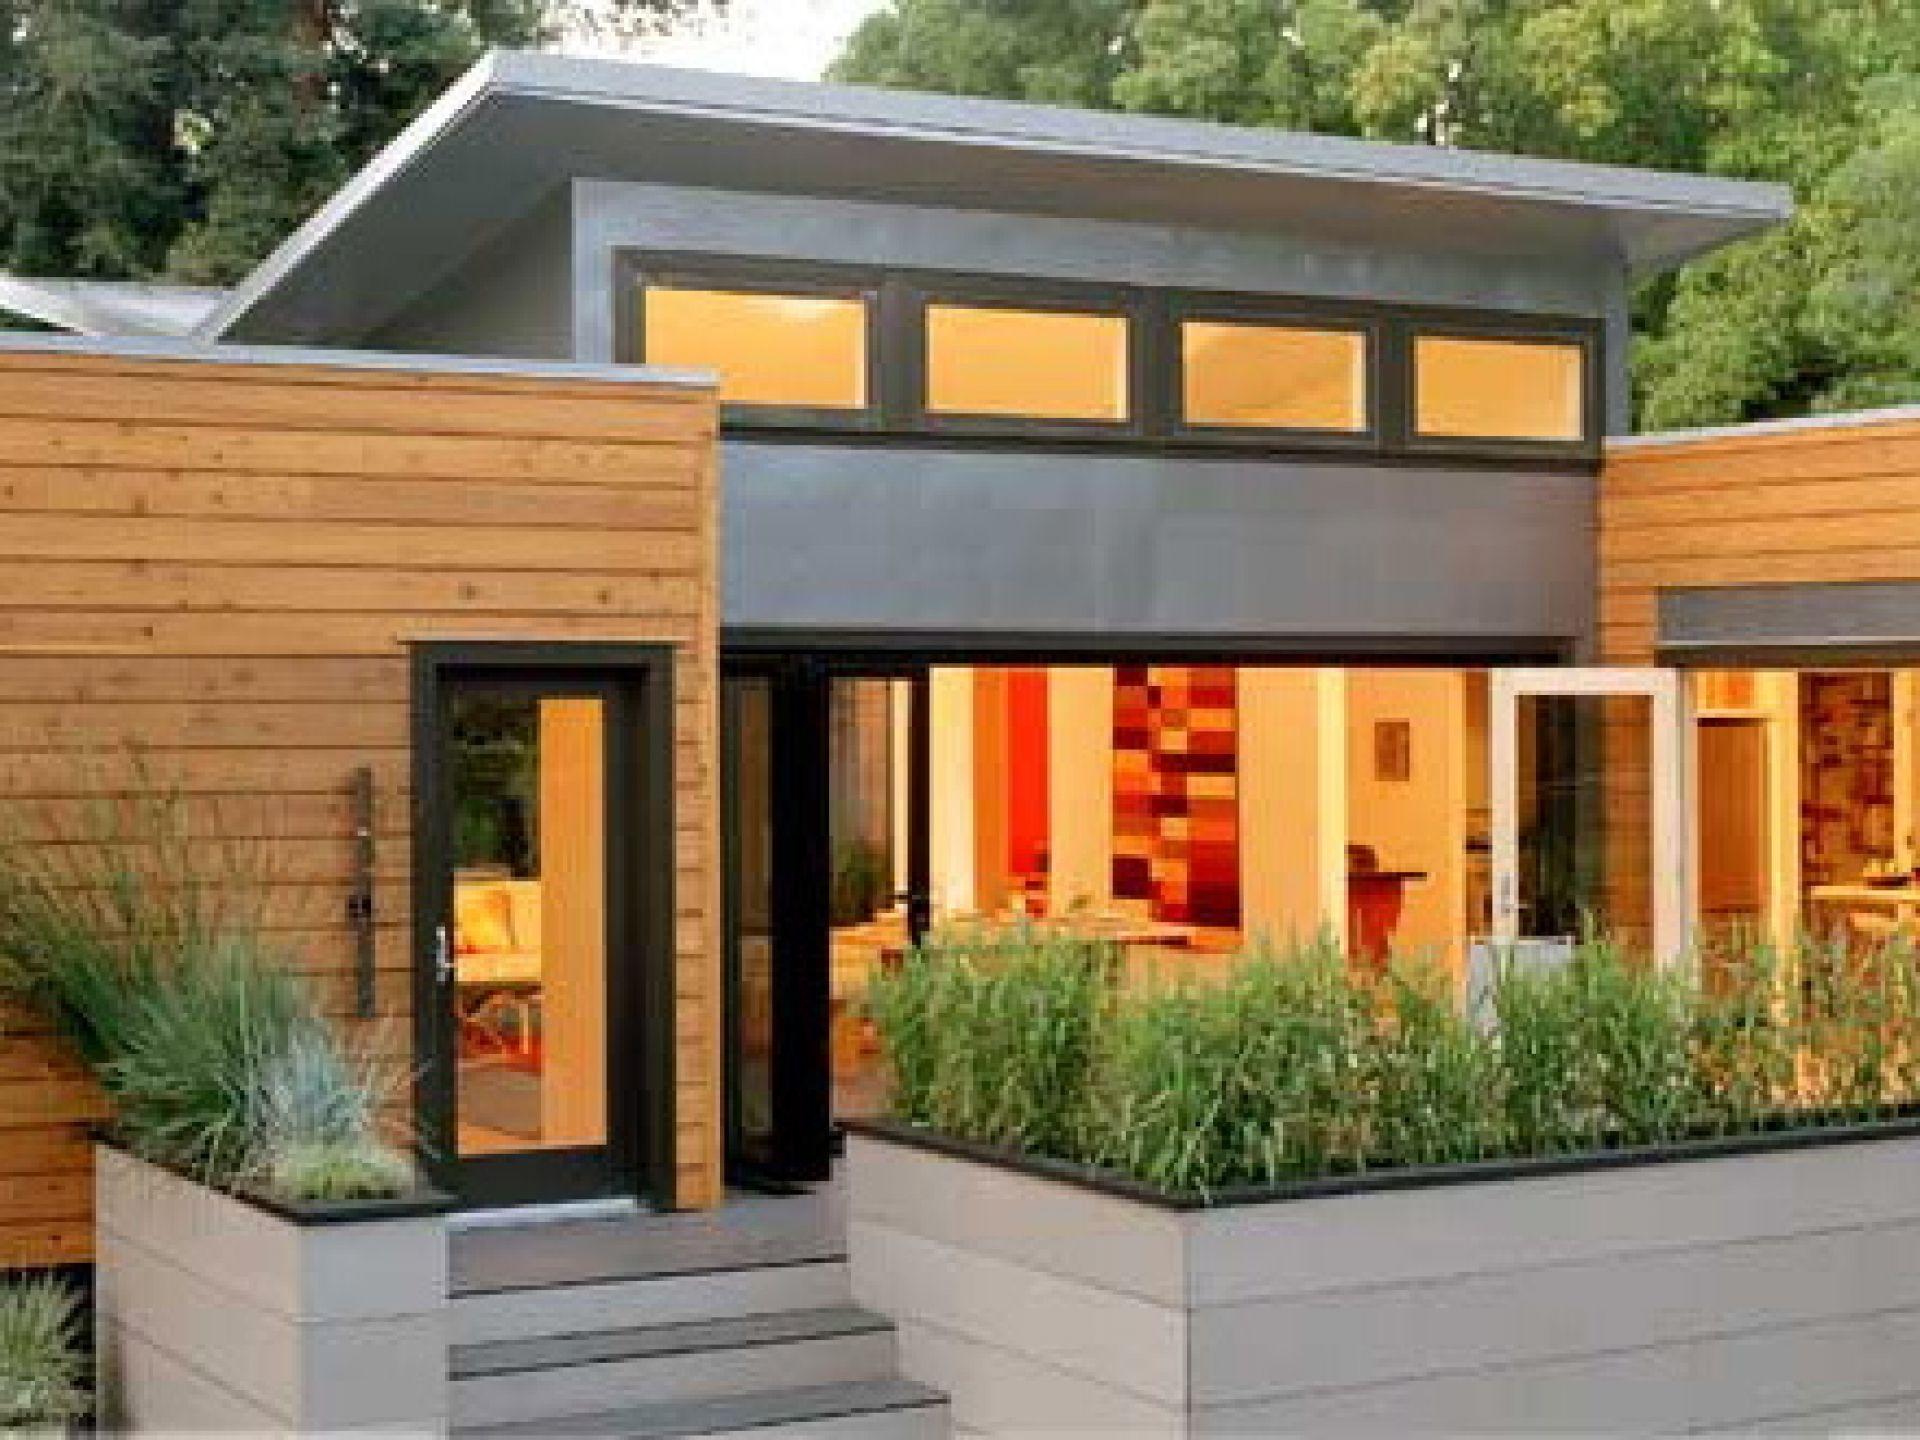 Architecture Home Design And Interior Marvelous Modernist Modern Modular Home Designs Captivating Modern Prefab Homes Modern Modular Homes Small Modern Home